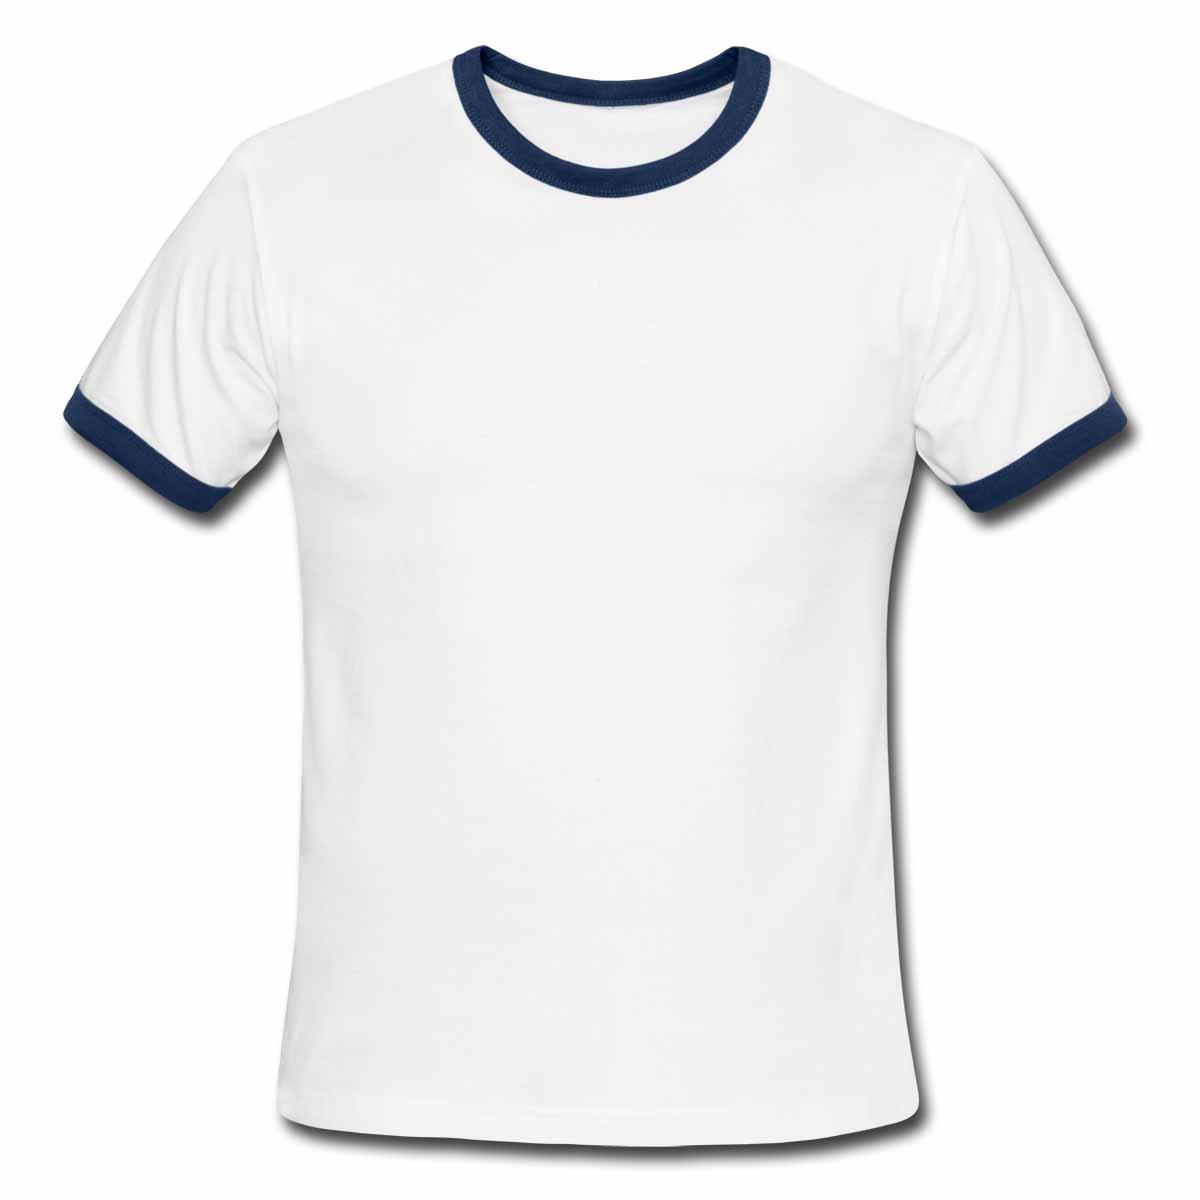 White tshirt joy studio design gallery best design for The best plain white t shirts